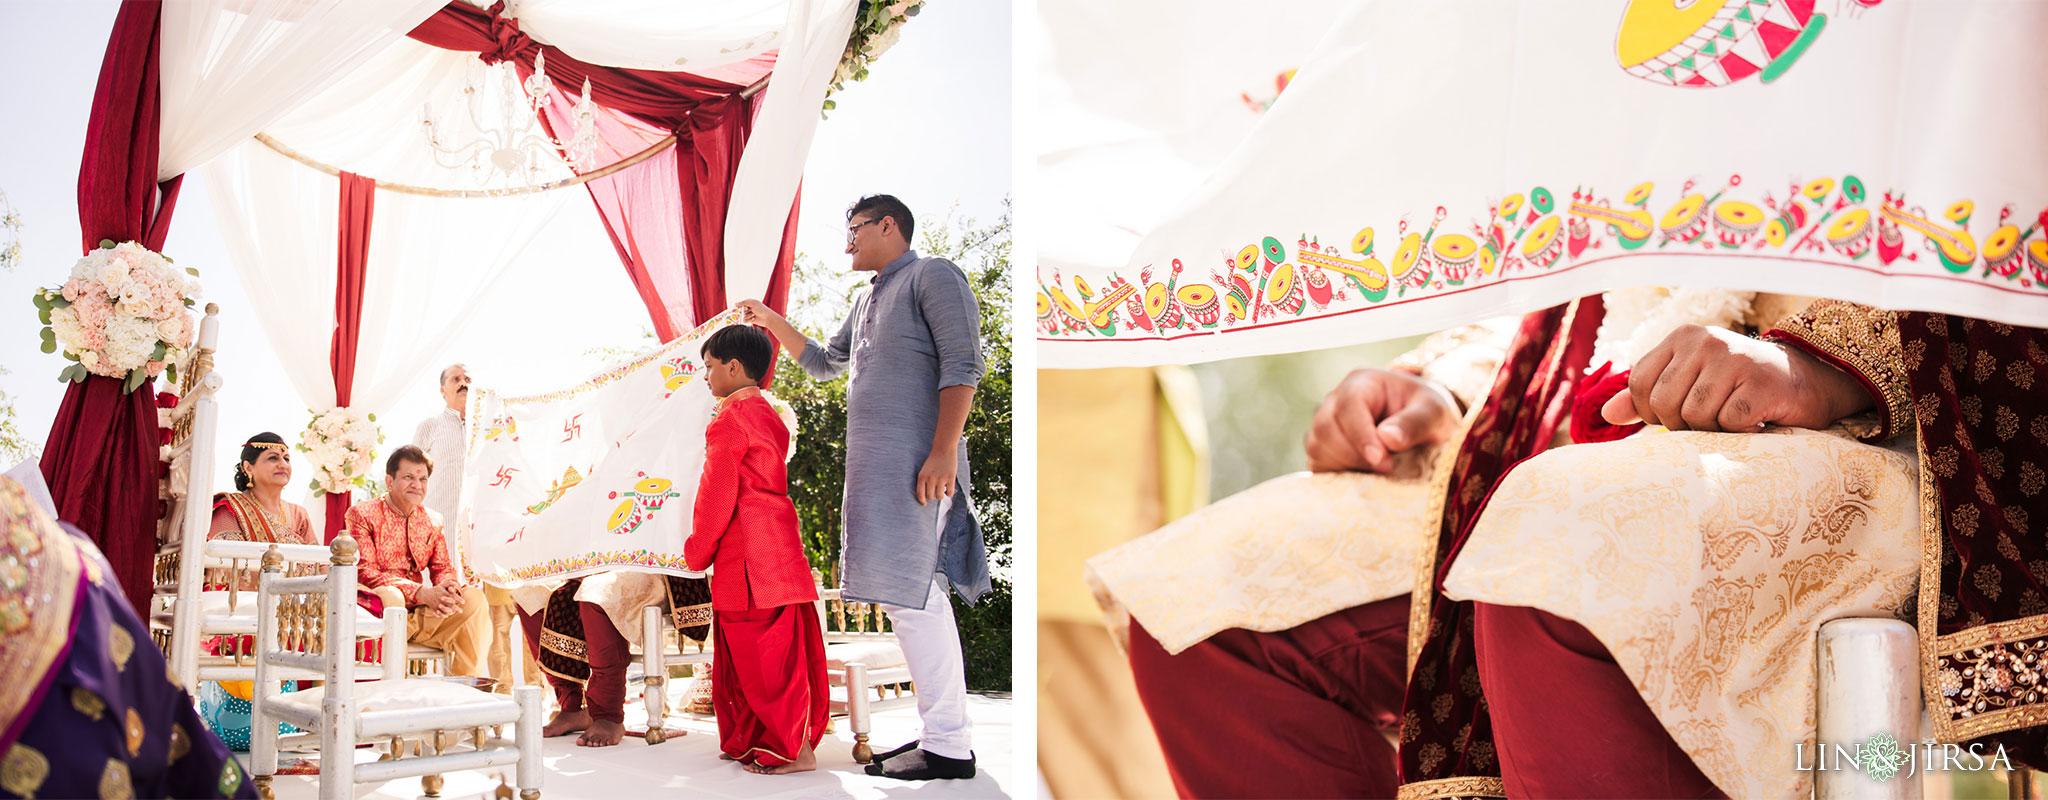 25 sheraton carlsbad resort indian wedding photography